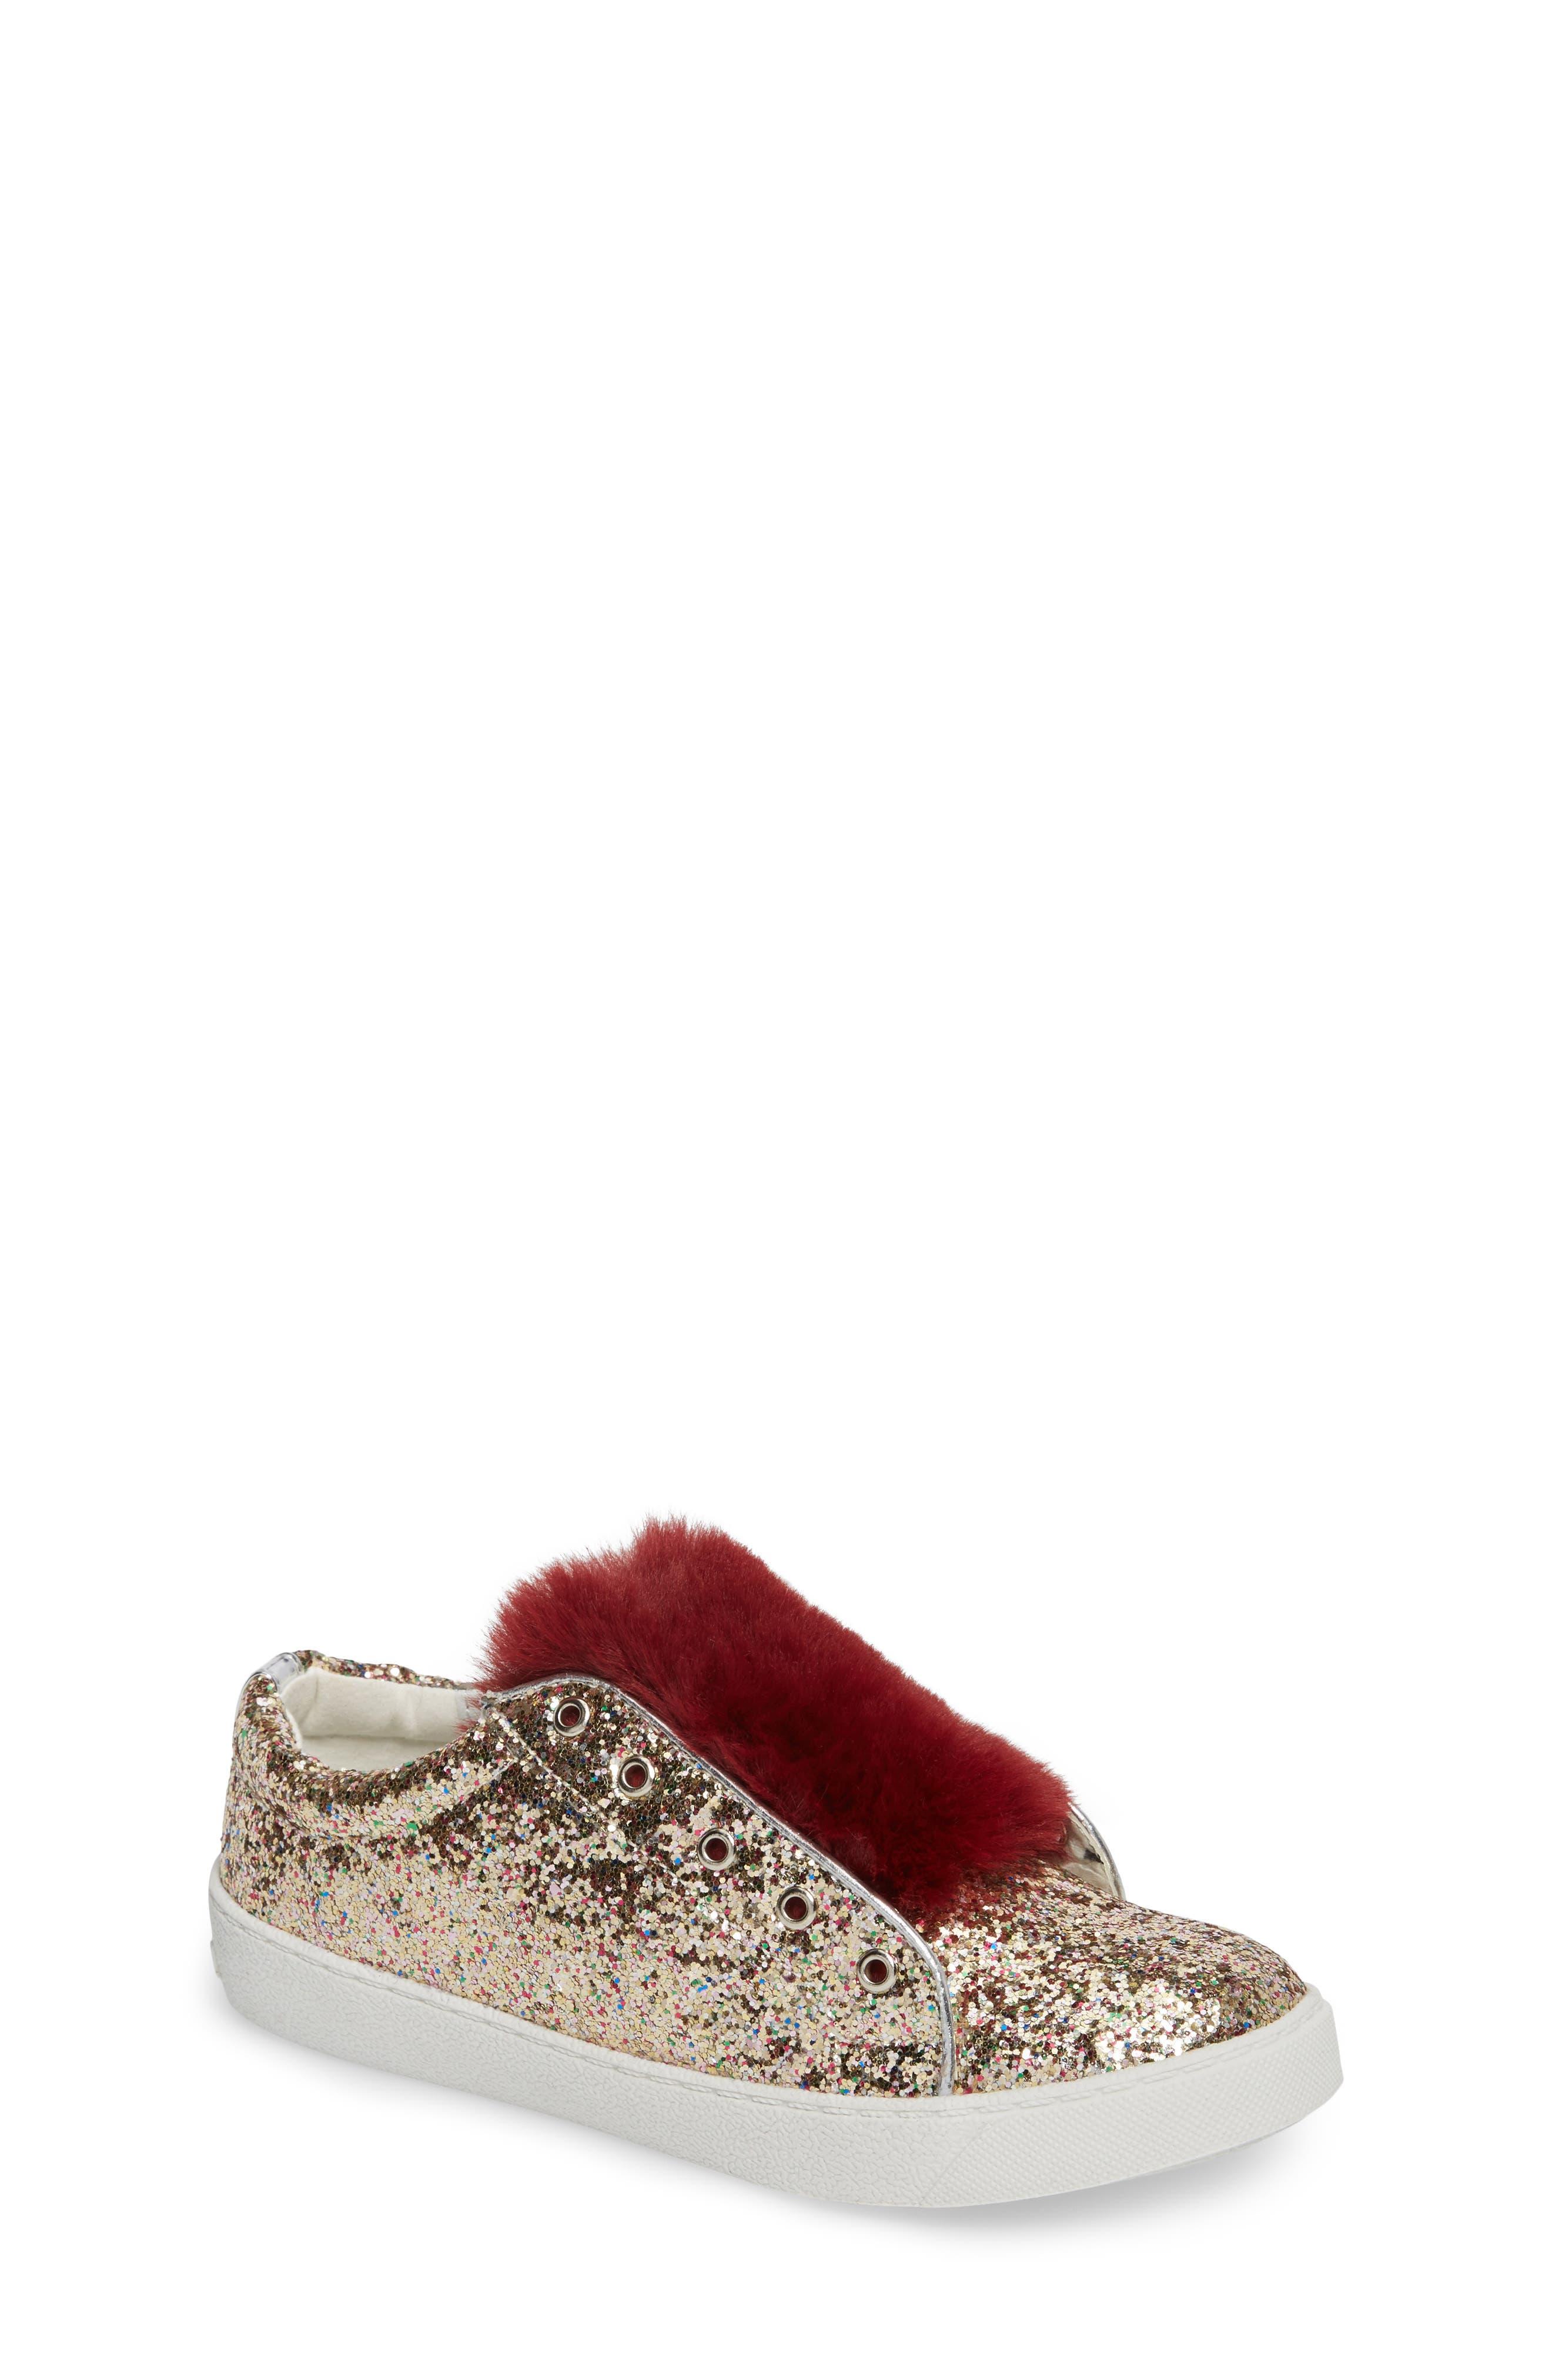 Main Image - Sam Edelman Britt Rita Faux Fur Glitter Sneaker (Toddler, Little Kid & Big Kid)